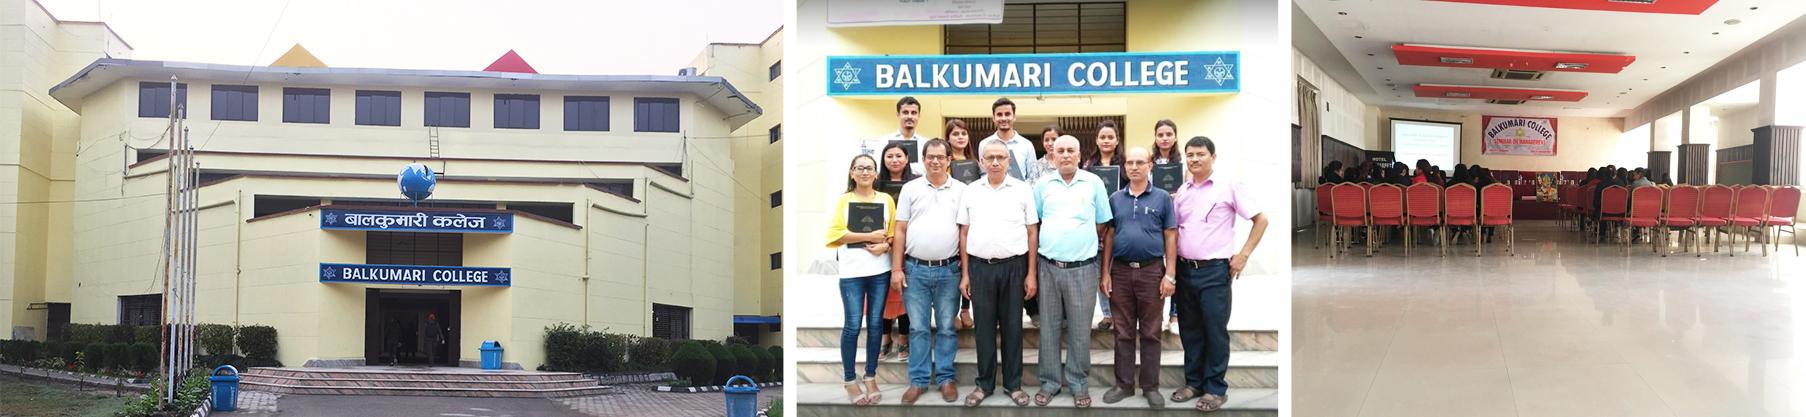 Balkumari College